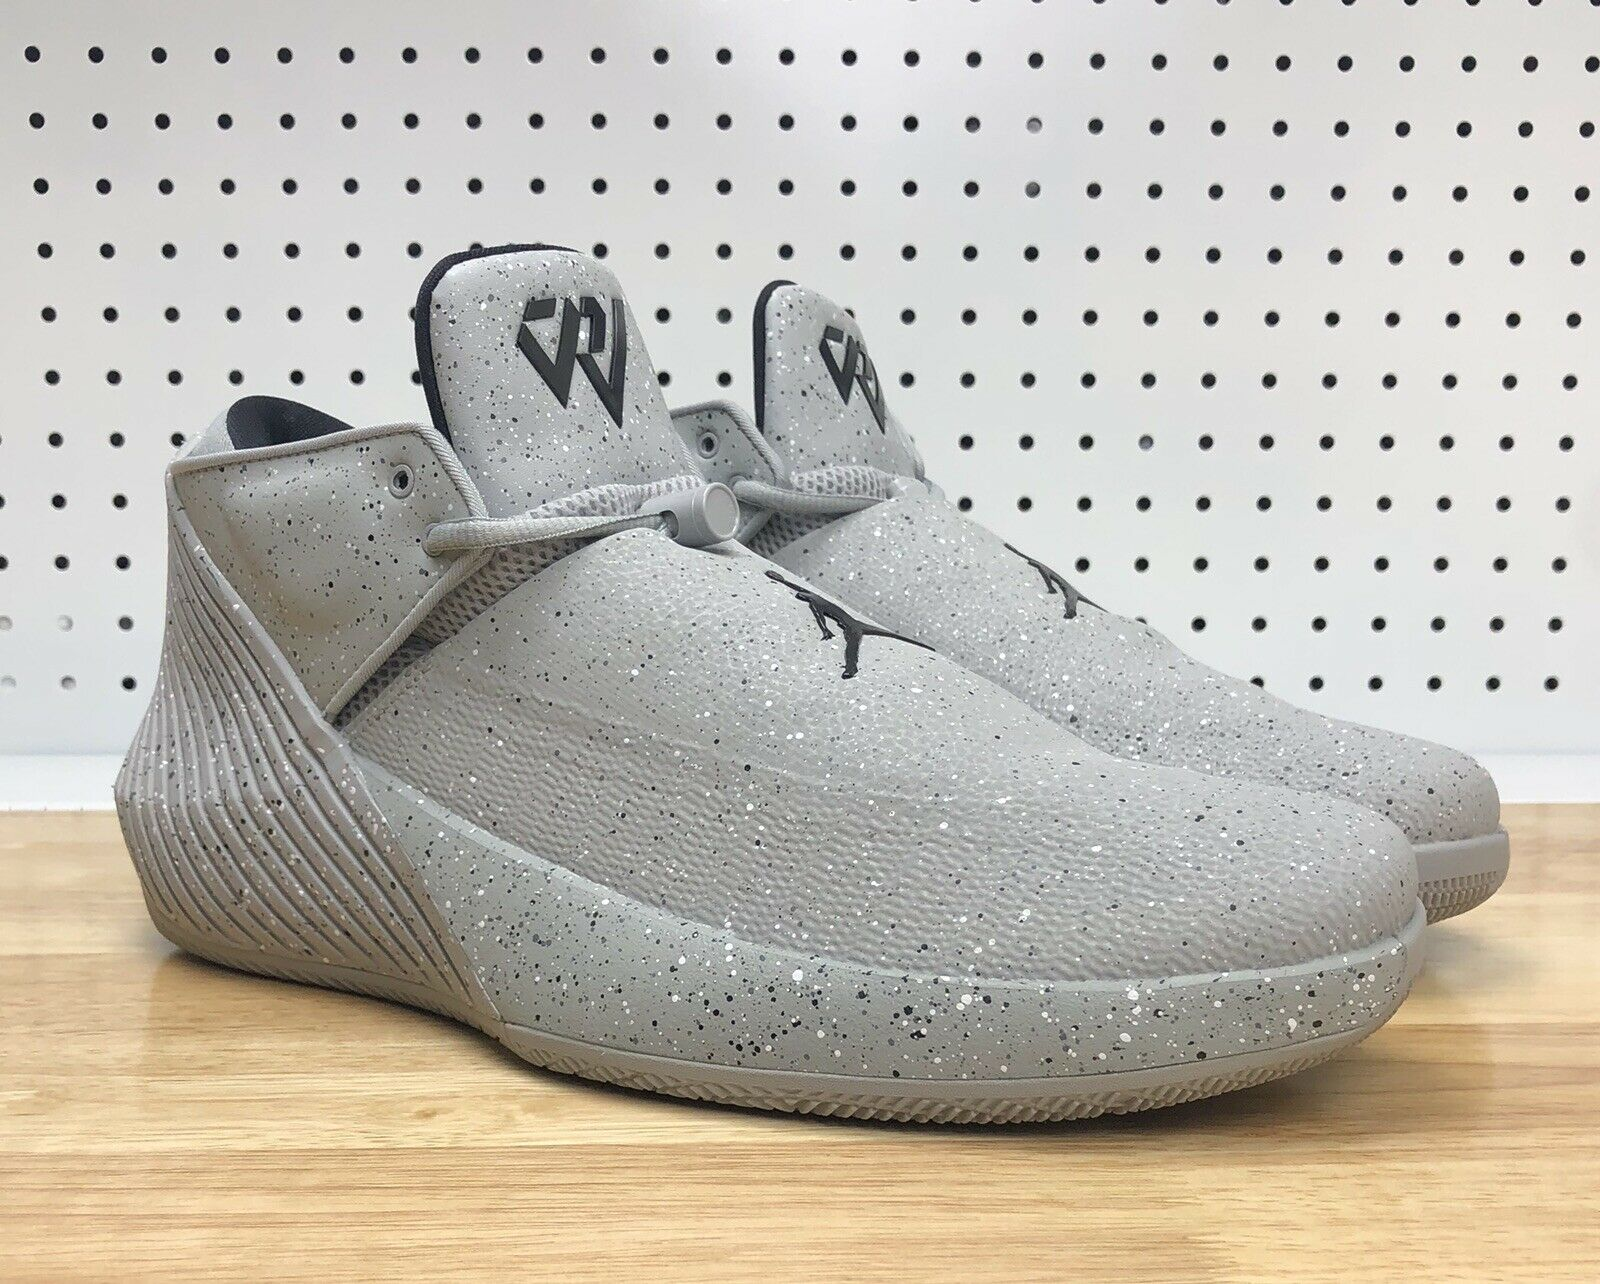 Nike Air Jordan Why Not ZerO.1 Low Cement Grey AR0043-002 Men's Sz 12 Westbrook